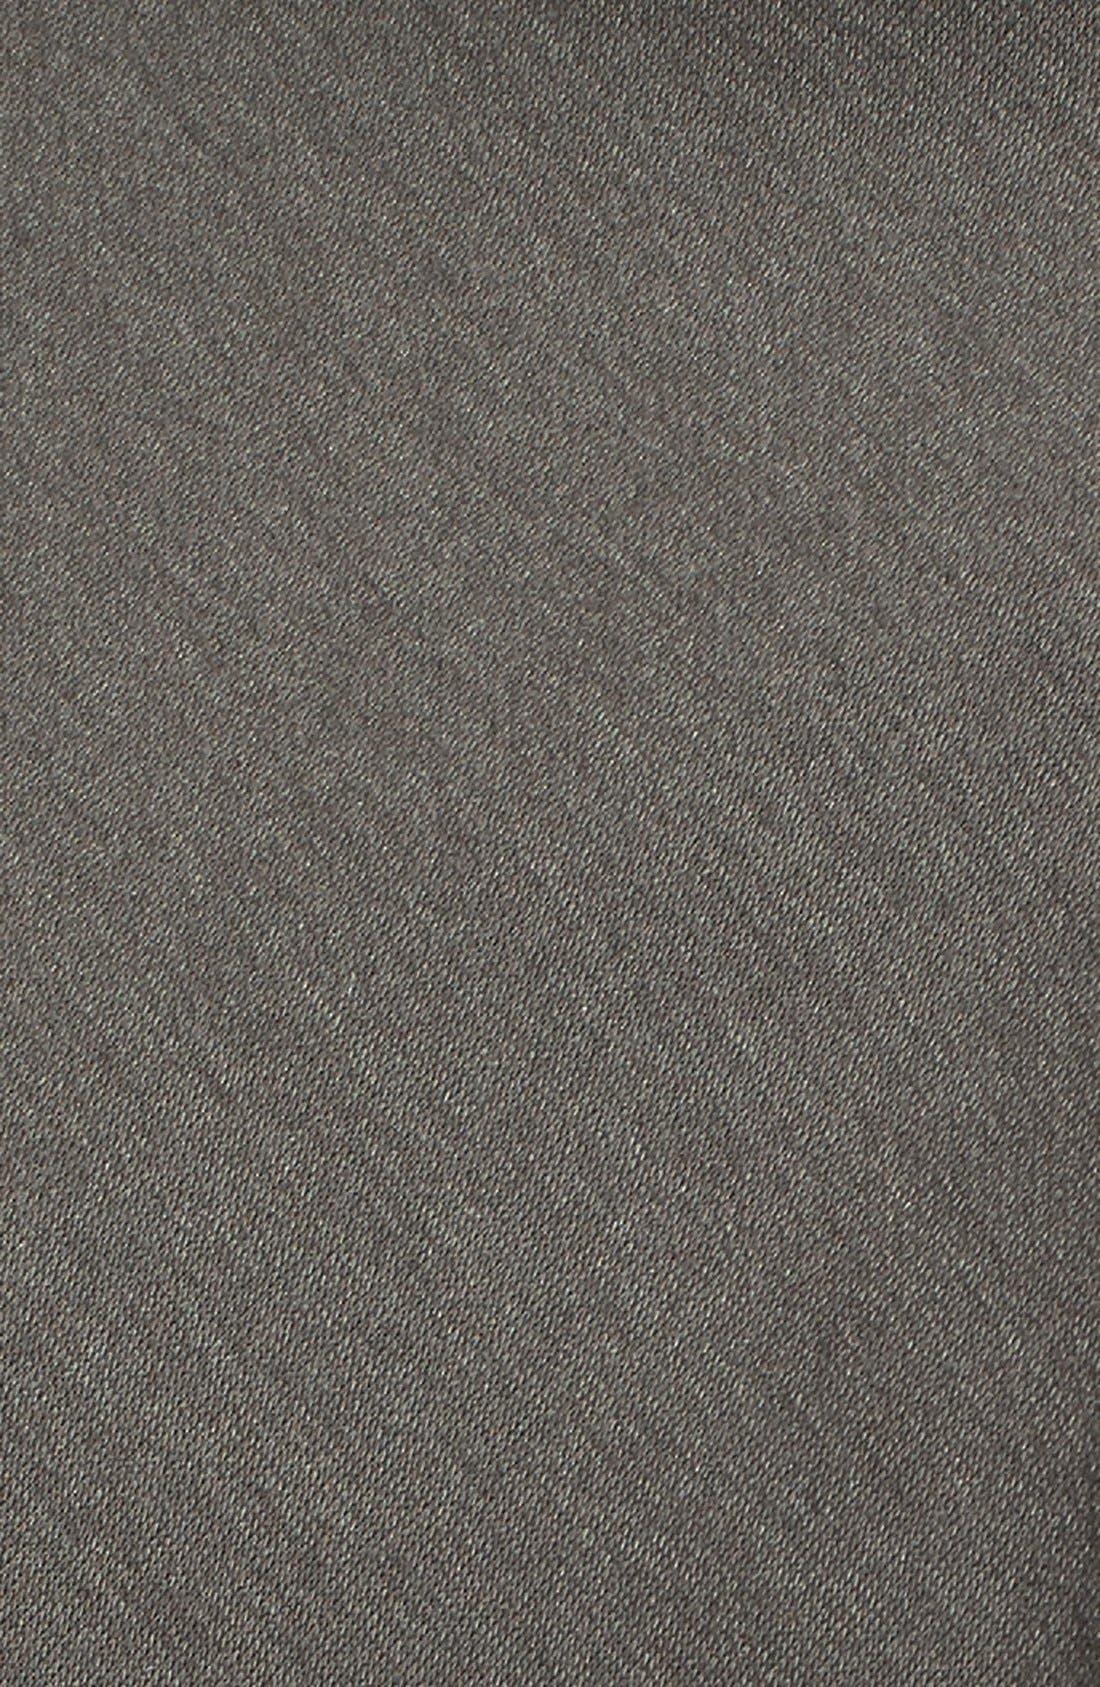 ,                             One-Button Fleece Wrap Cardigan,                             Alternate thumbnail 91, color,                             333